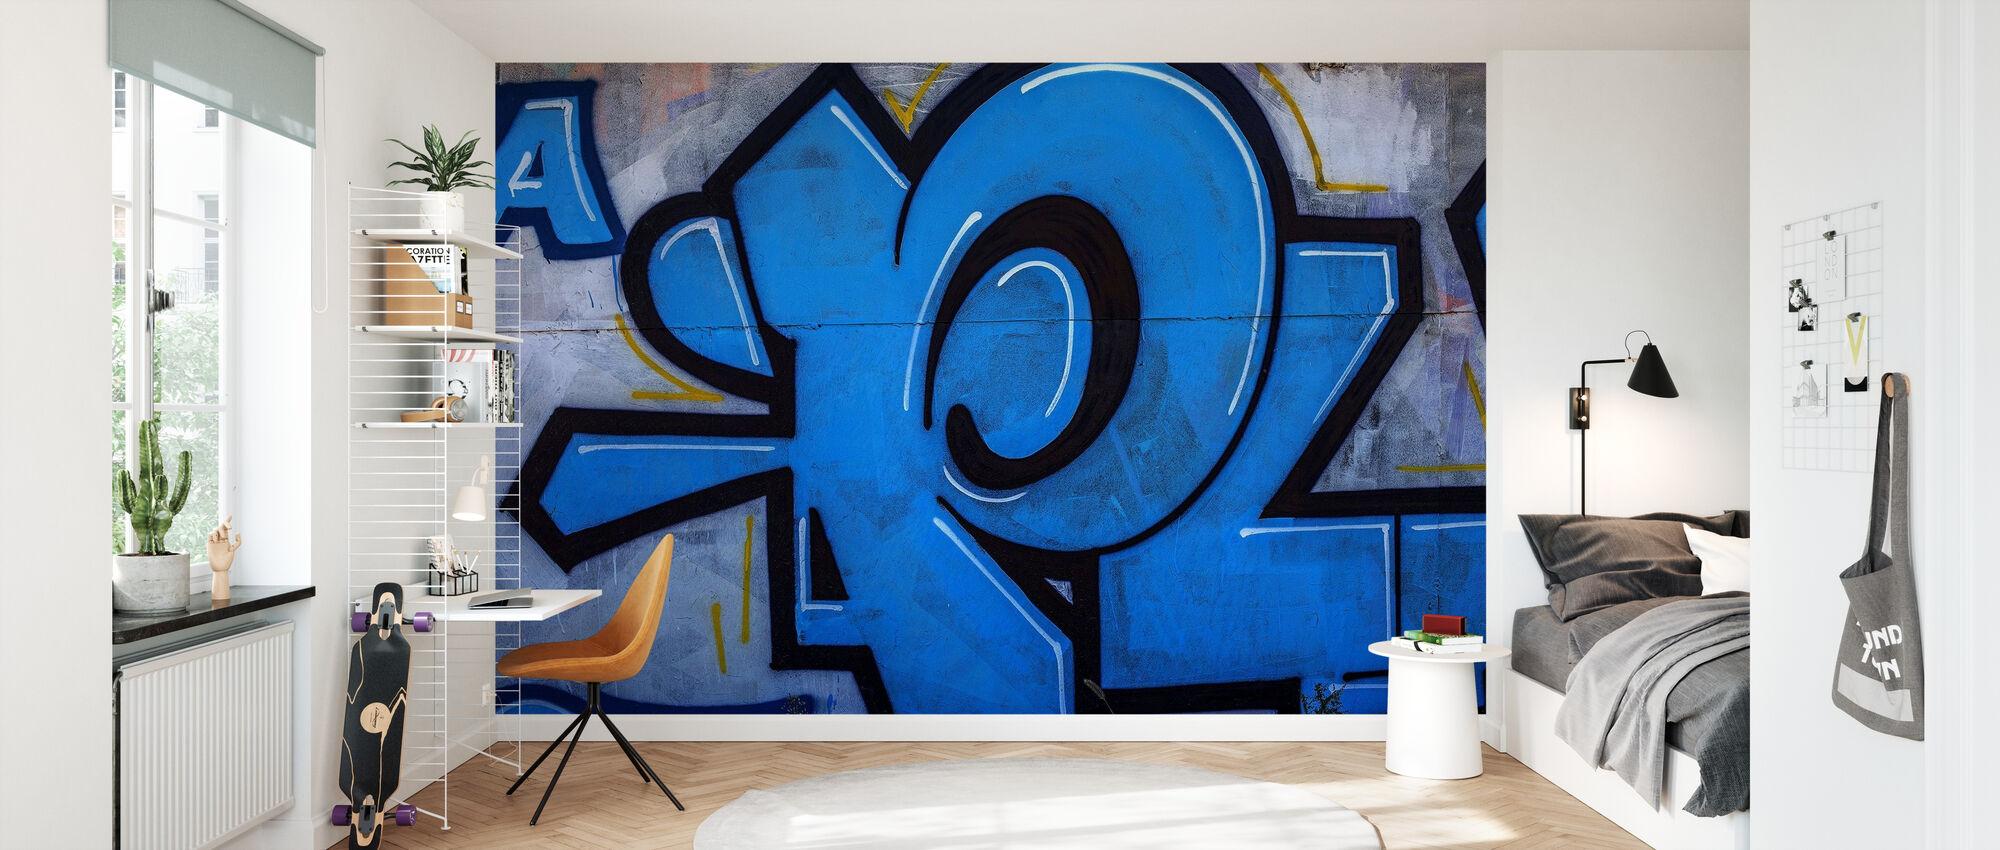 Blue Detail from Graffiti Wall - Wallpaper - Kids Room